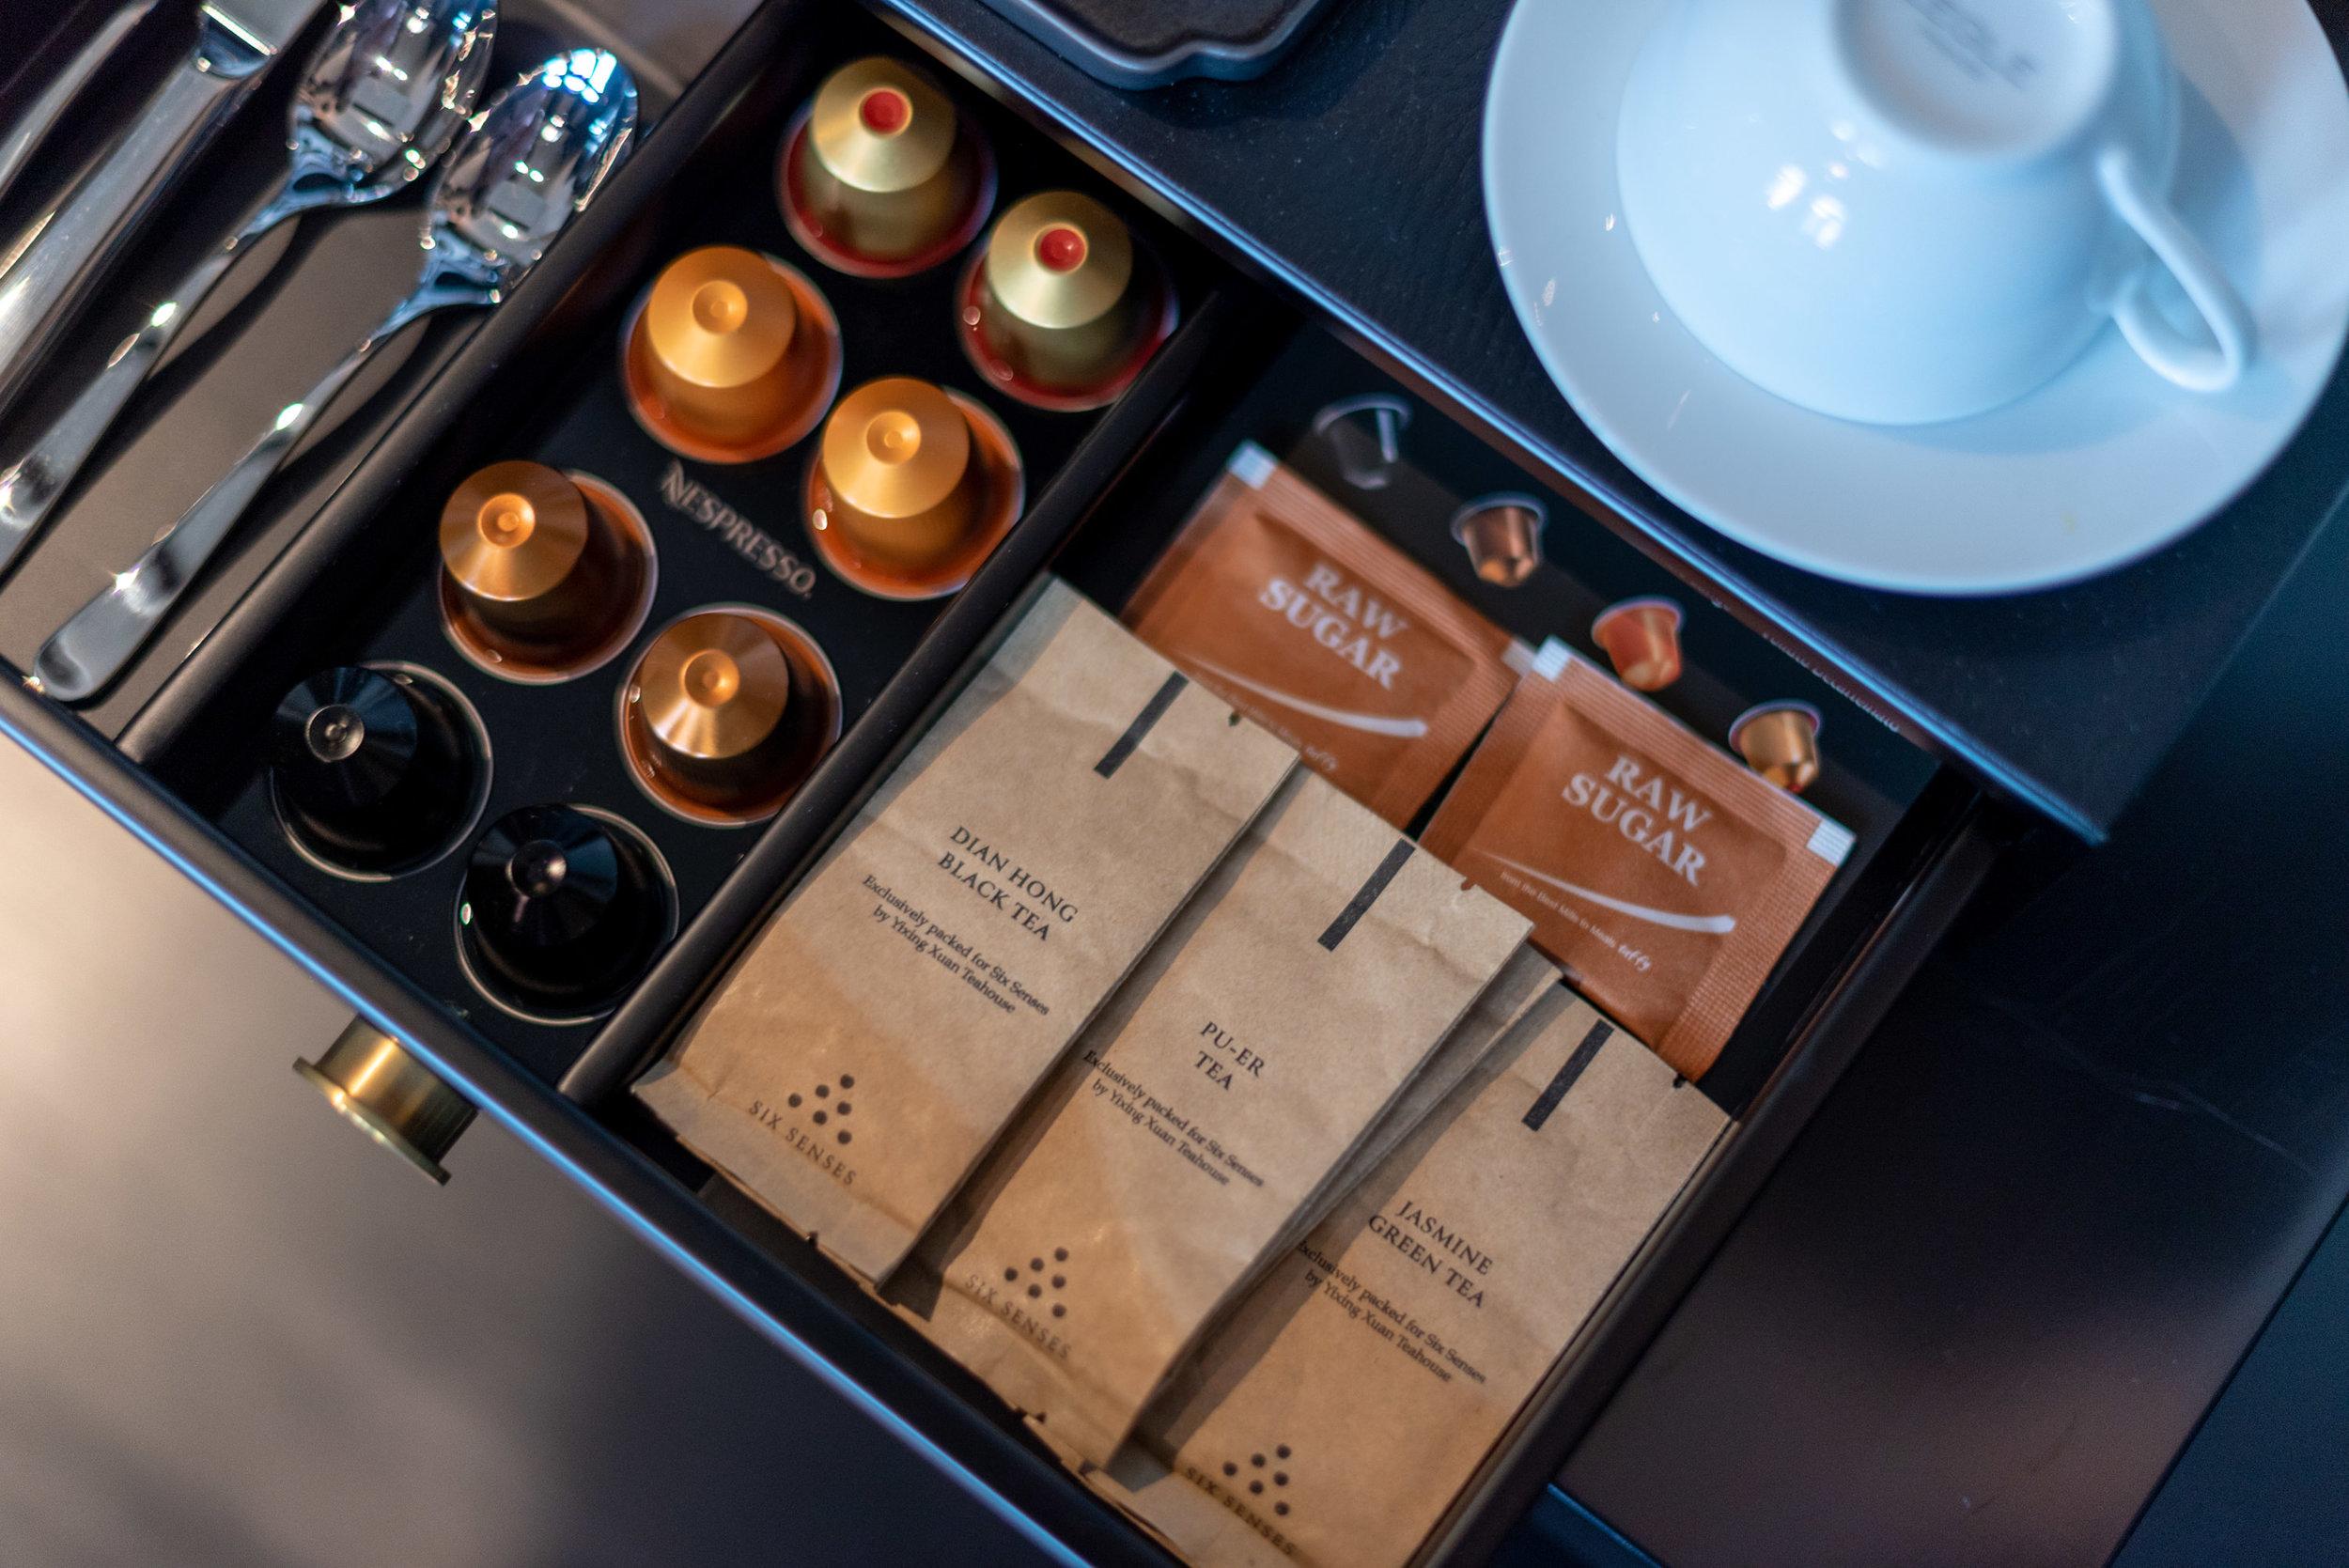 Tea Selection and Nespresso Coffee Capsules  Duxton Duplex Suite - Six Senses Duxton